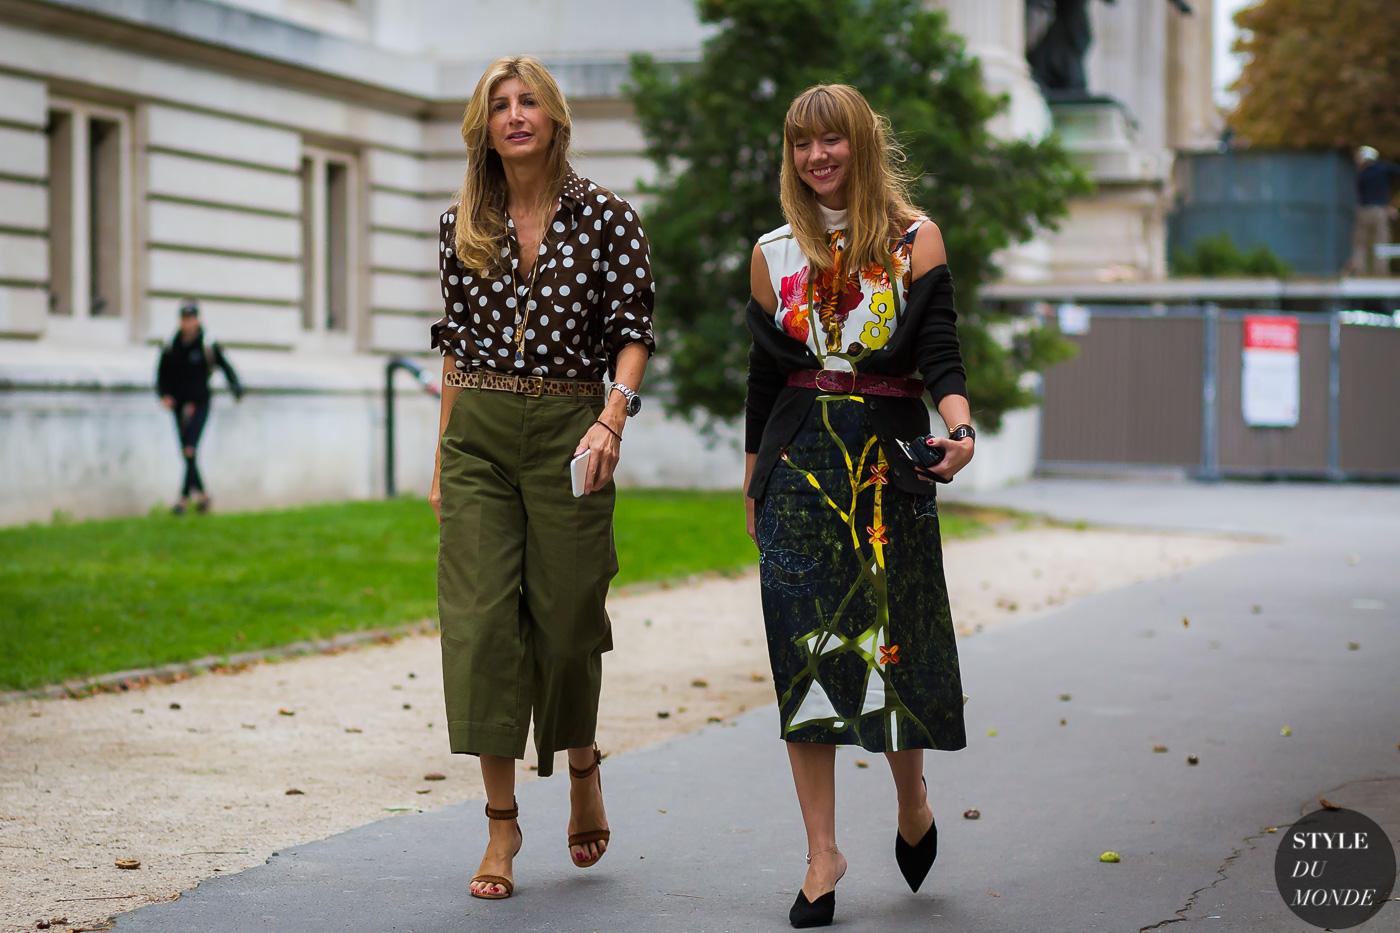 sarah-rutson-and-lisa-aiken-by-styledumonde-street-style-fashion-photography